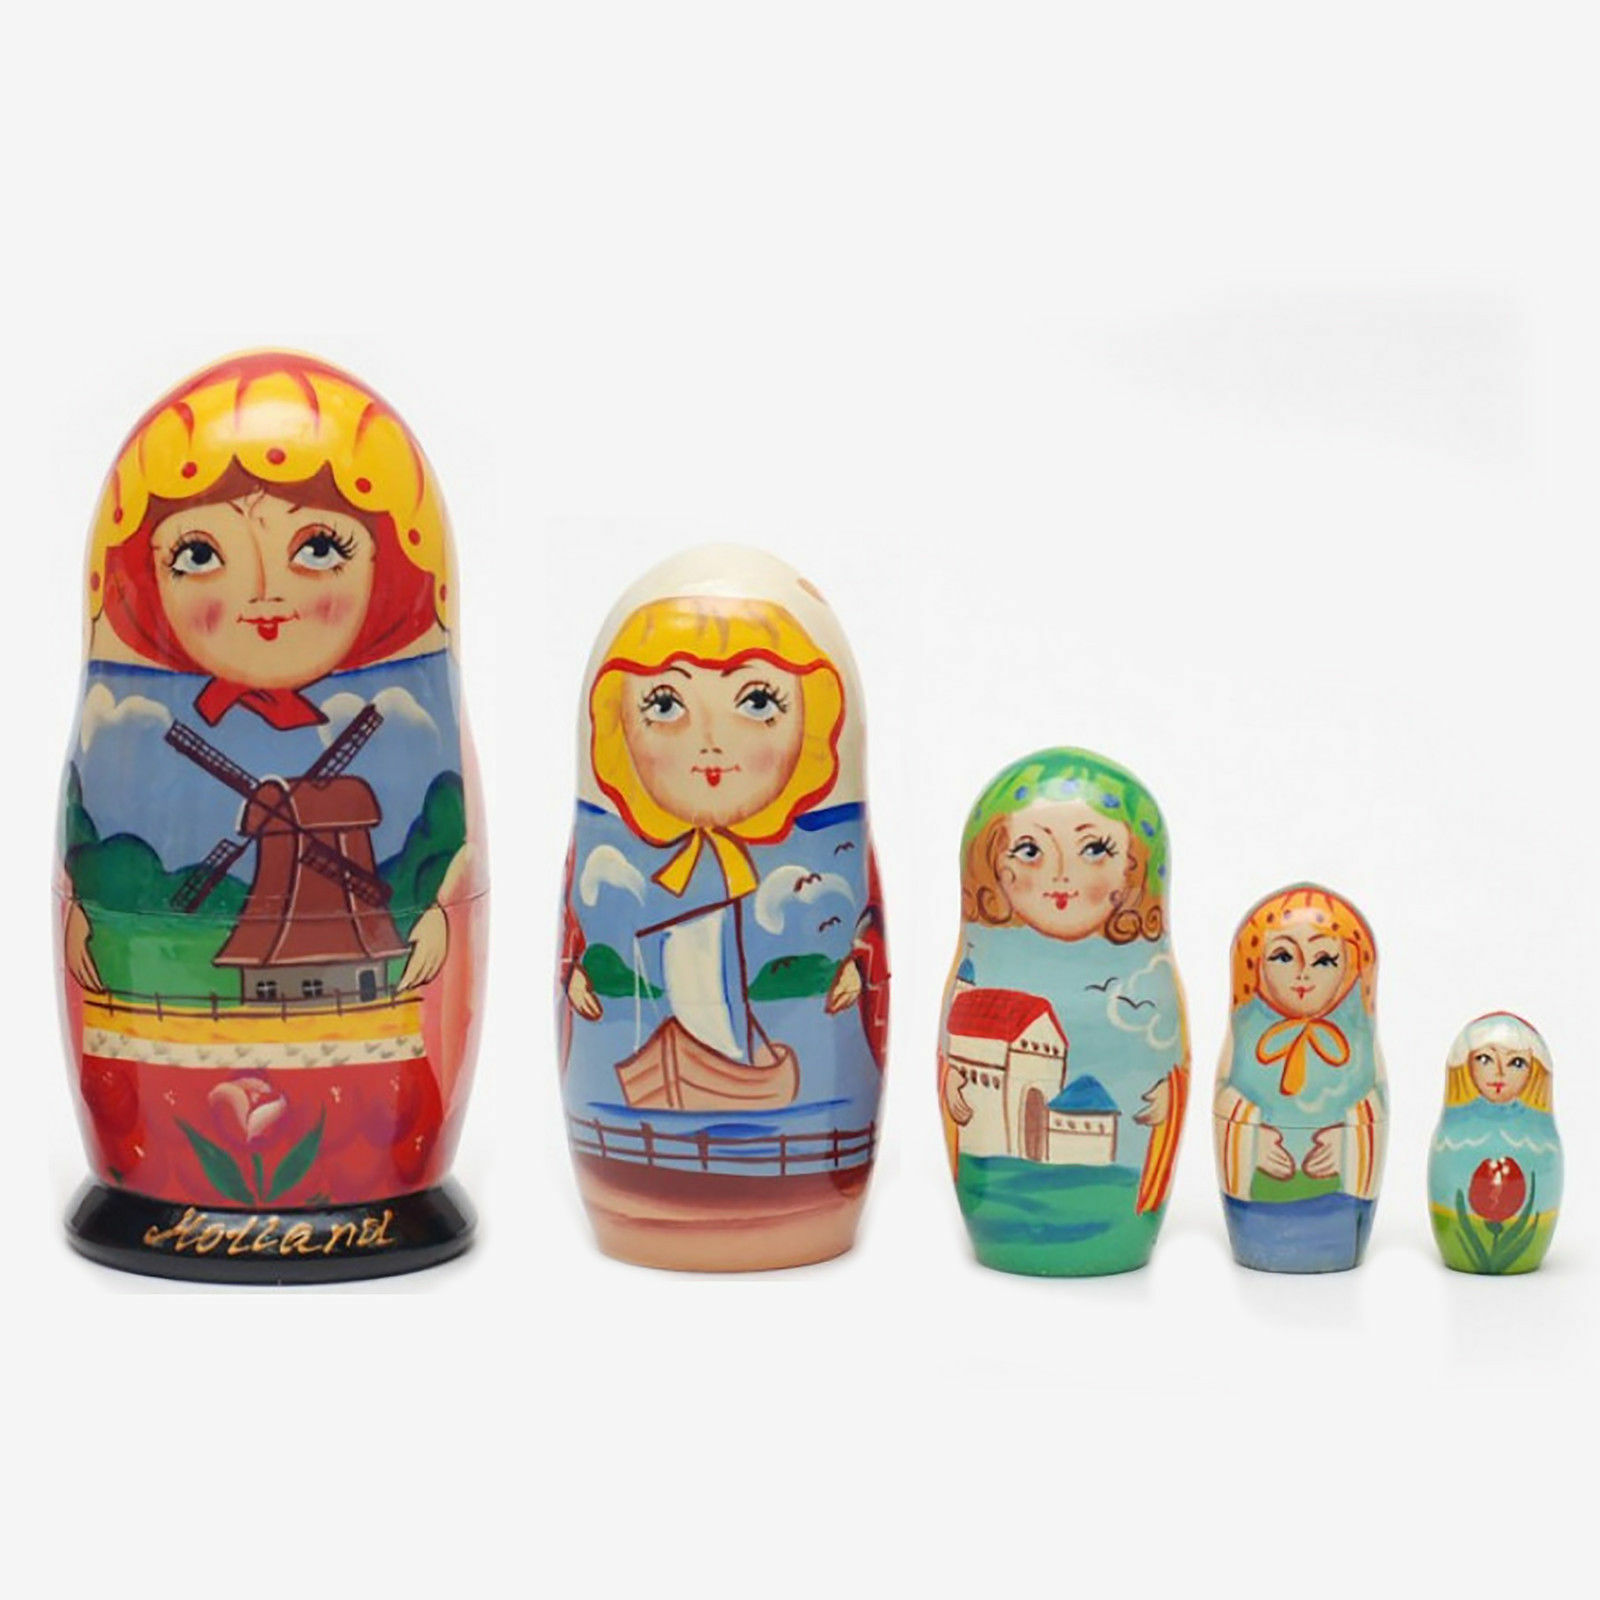 design unico Nesting Nesting Nesting bambolas Holle matryoshka He painted Signed russian baautobushka bambola  memorizzare